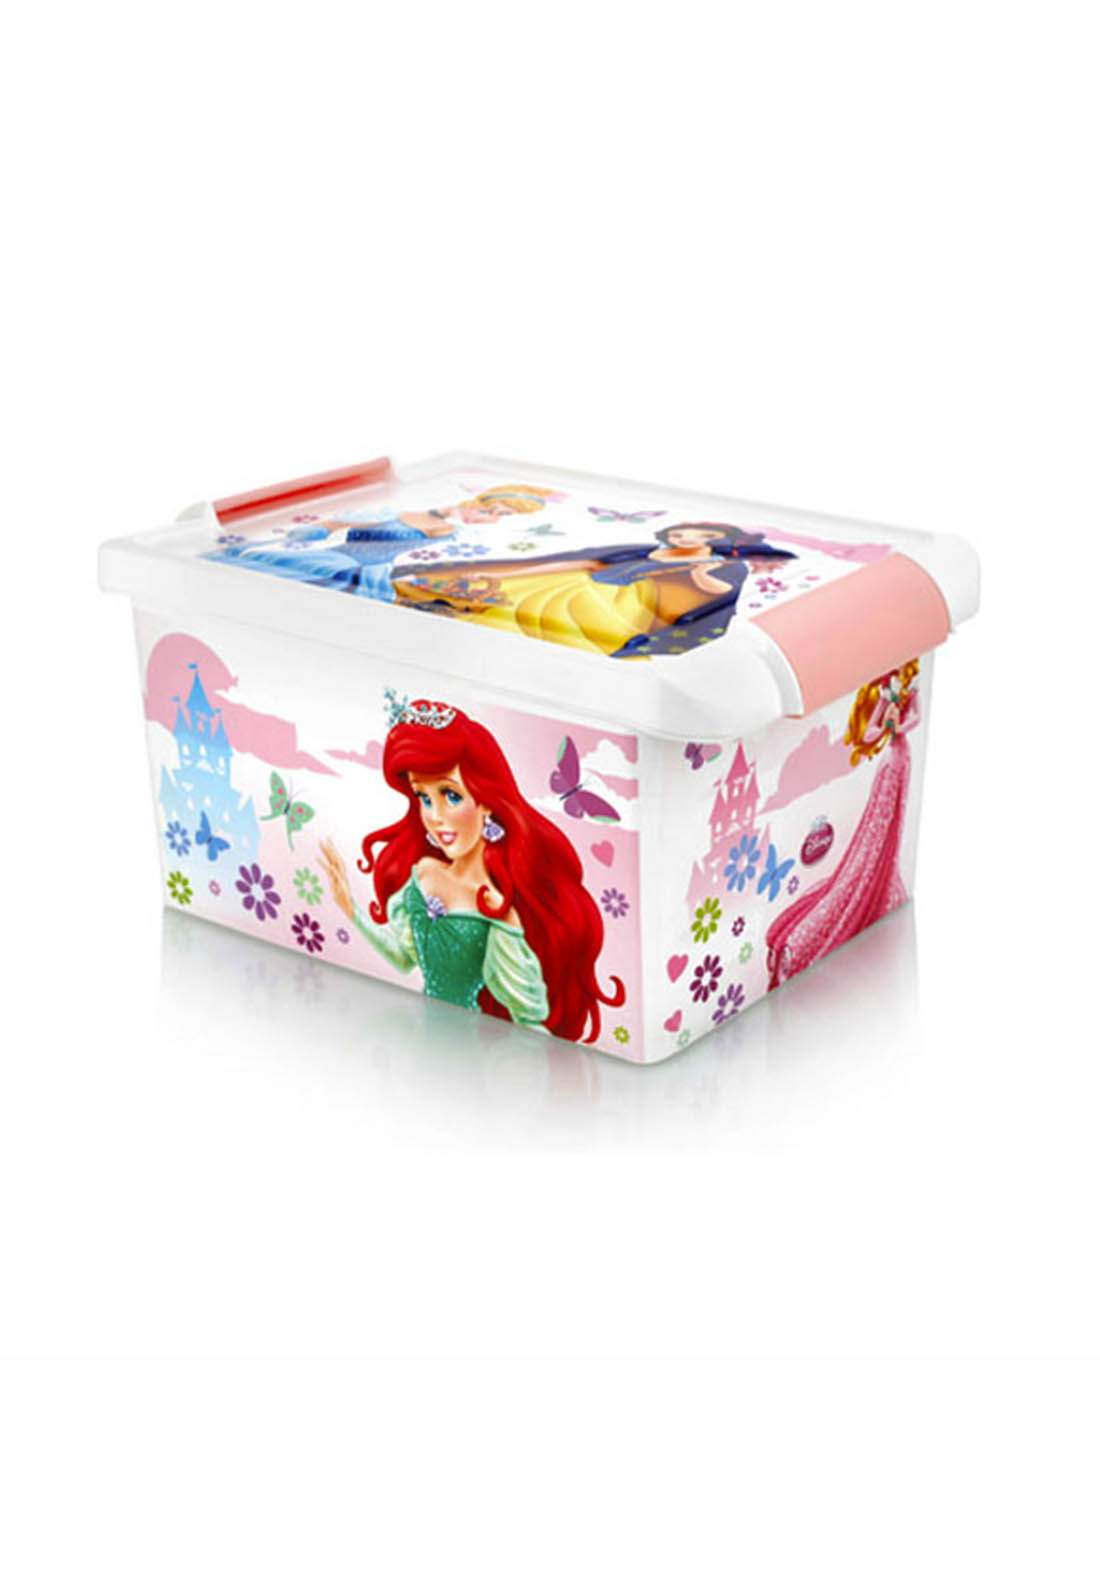 Homeket 3654 Kids Box صندوق حفظ الالعاب للاطفال